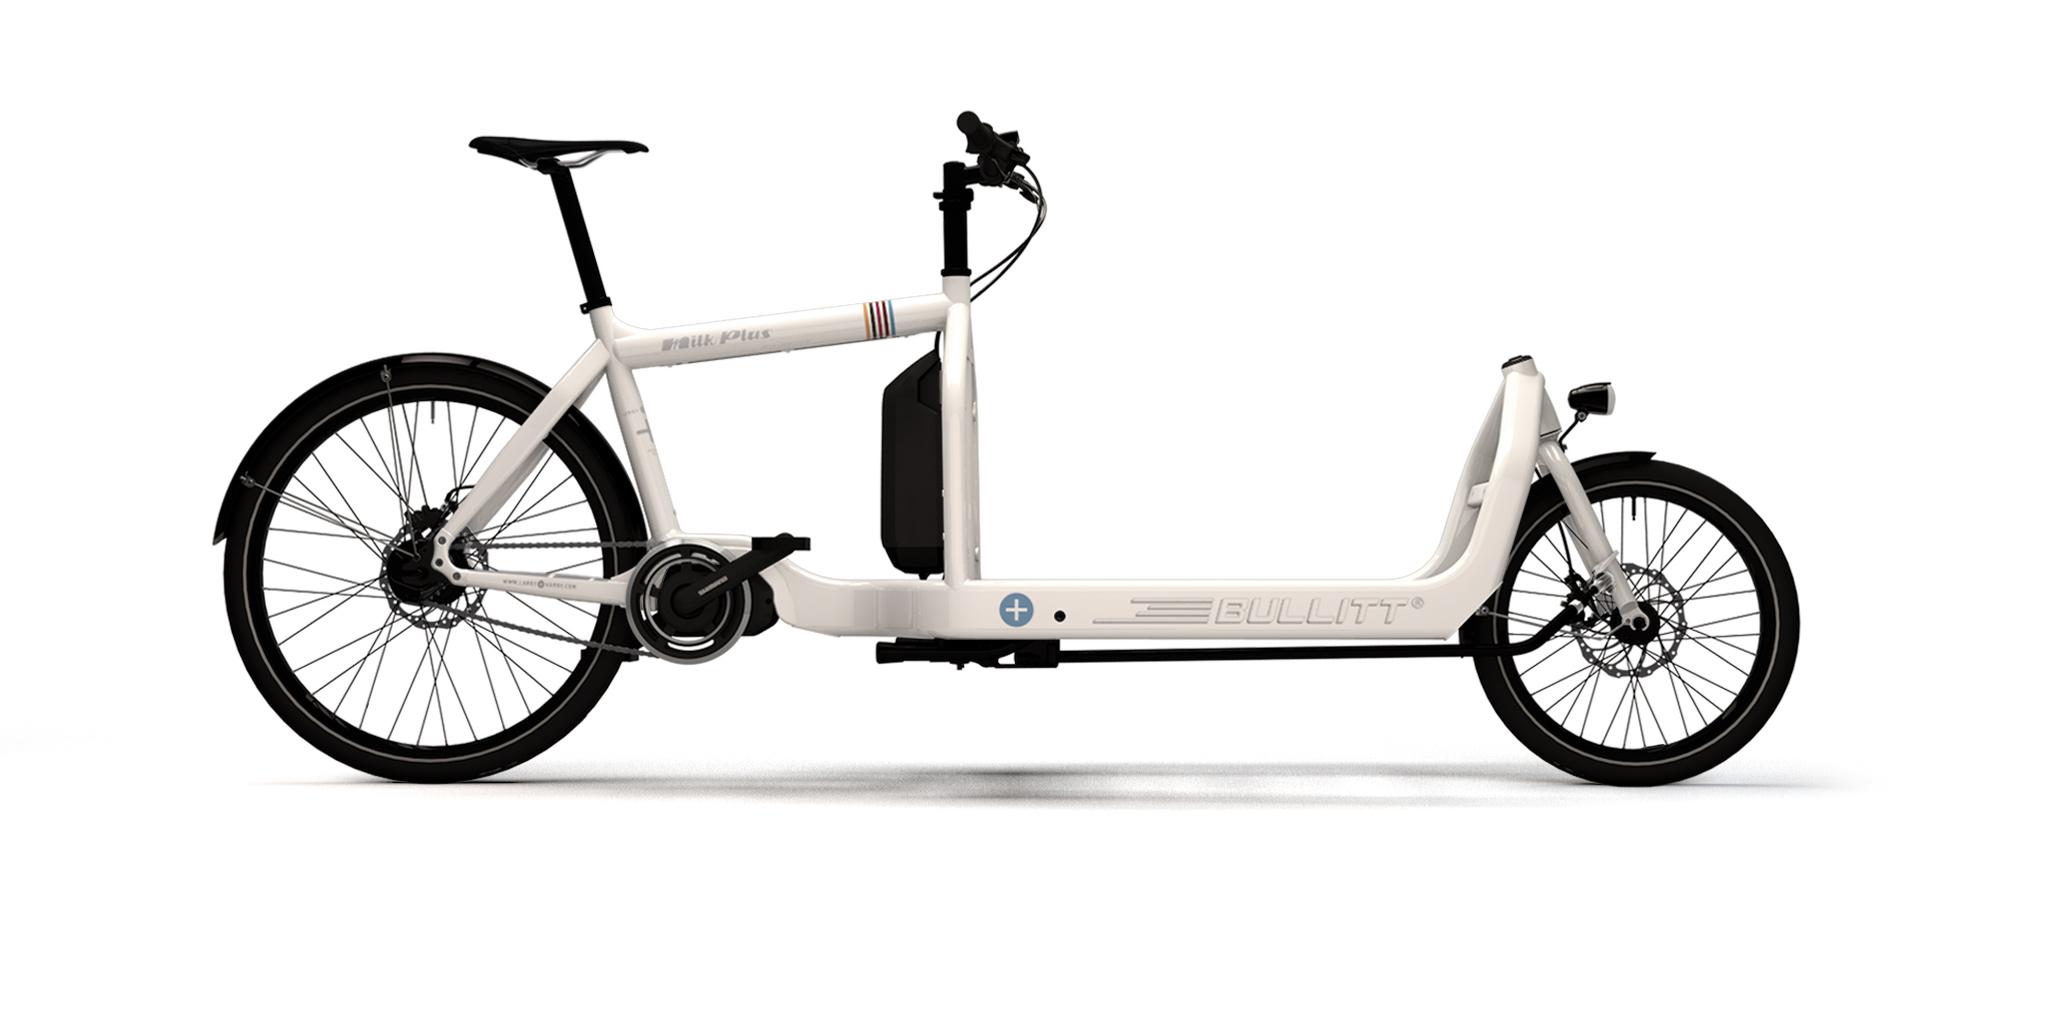 bullitt 11gang di2 riemen 20inch cargobike darmstadt. Black Bedroom Furniture Sets. Home Design Ideas